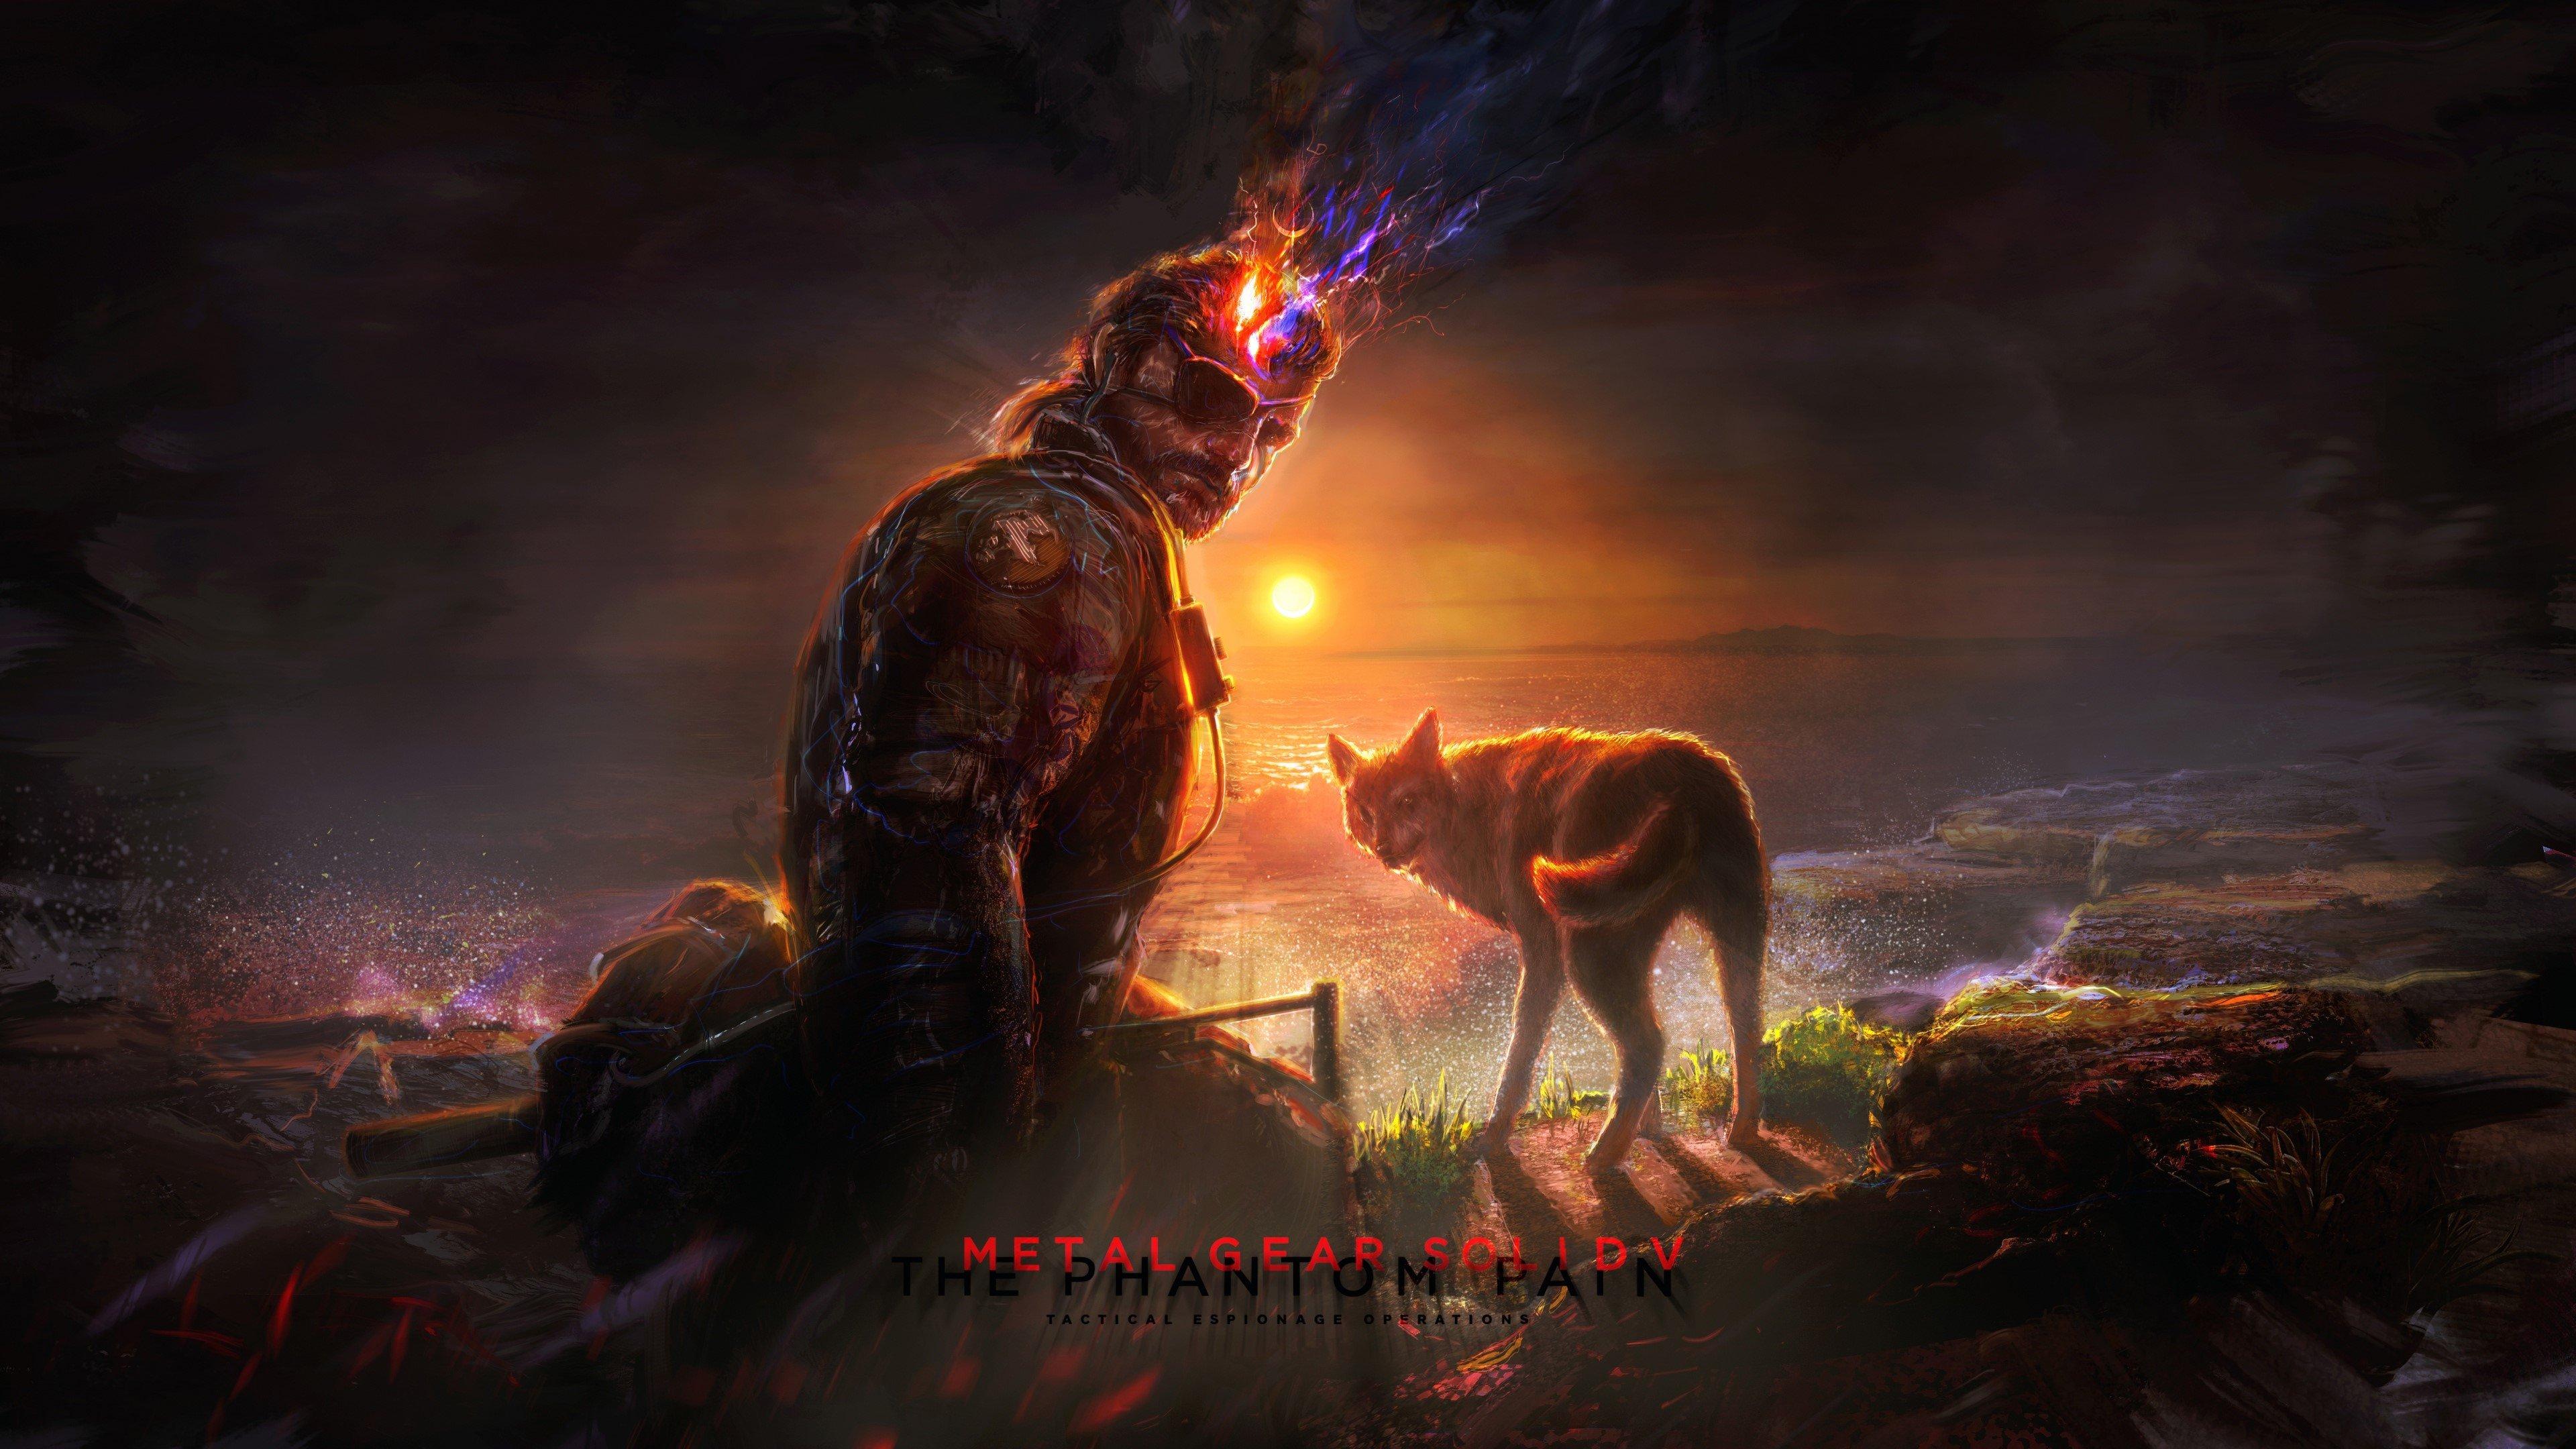 Wallpaper Drawing Metal Gear solid V The phantom pain